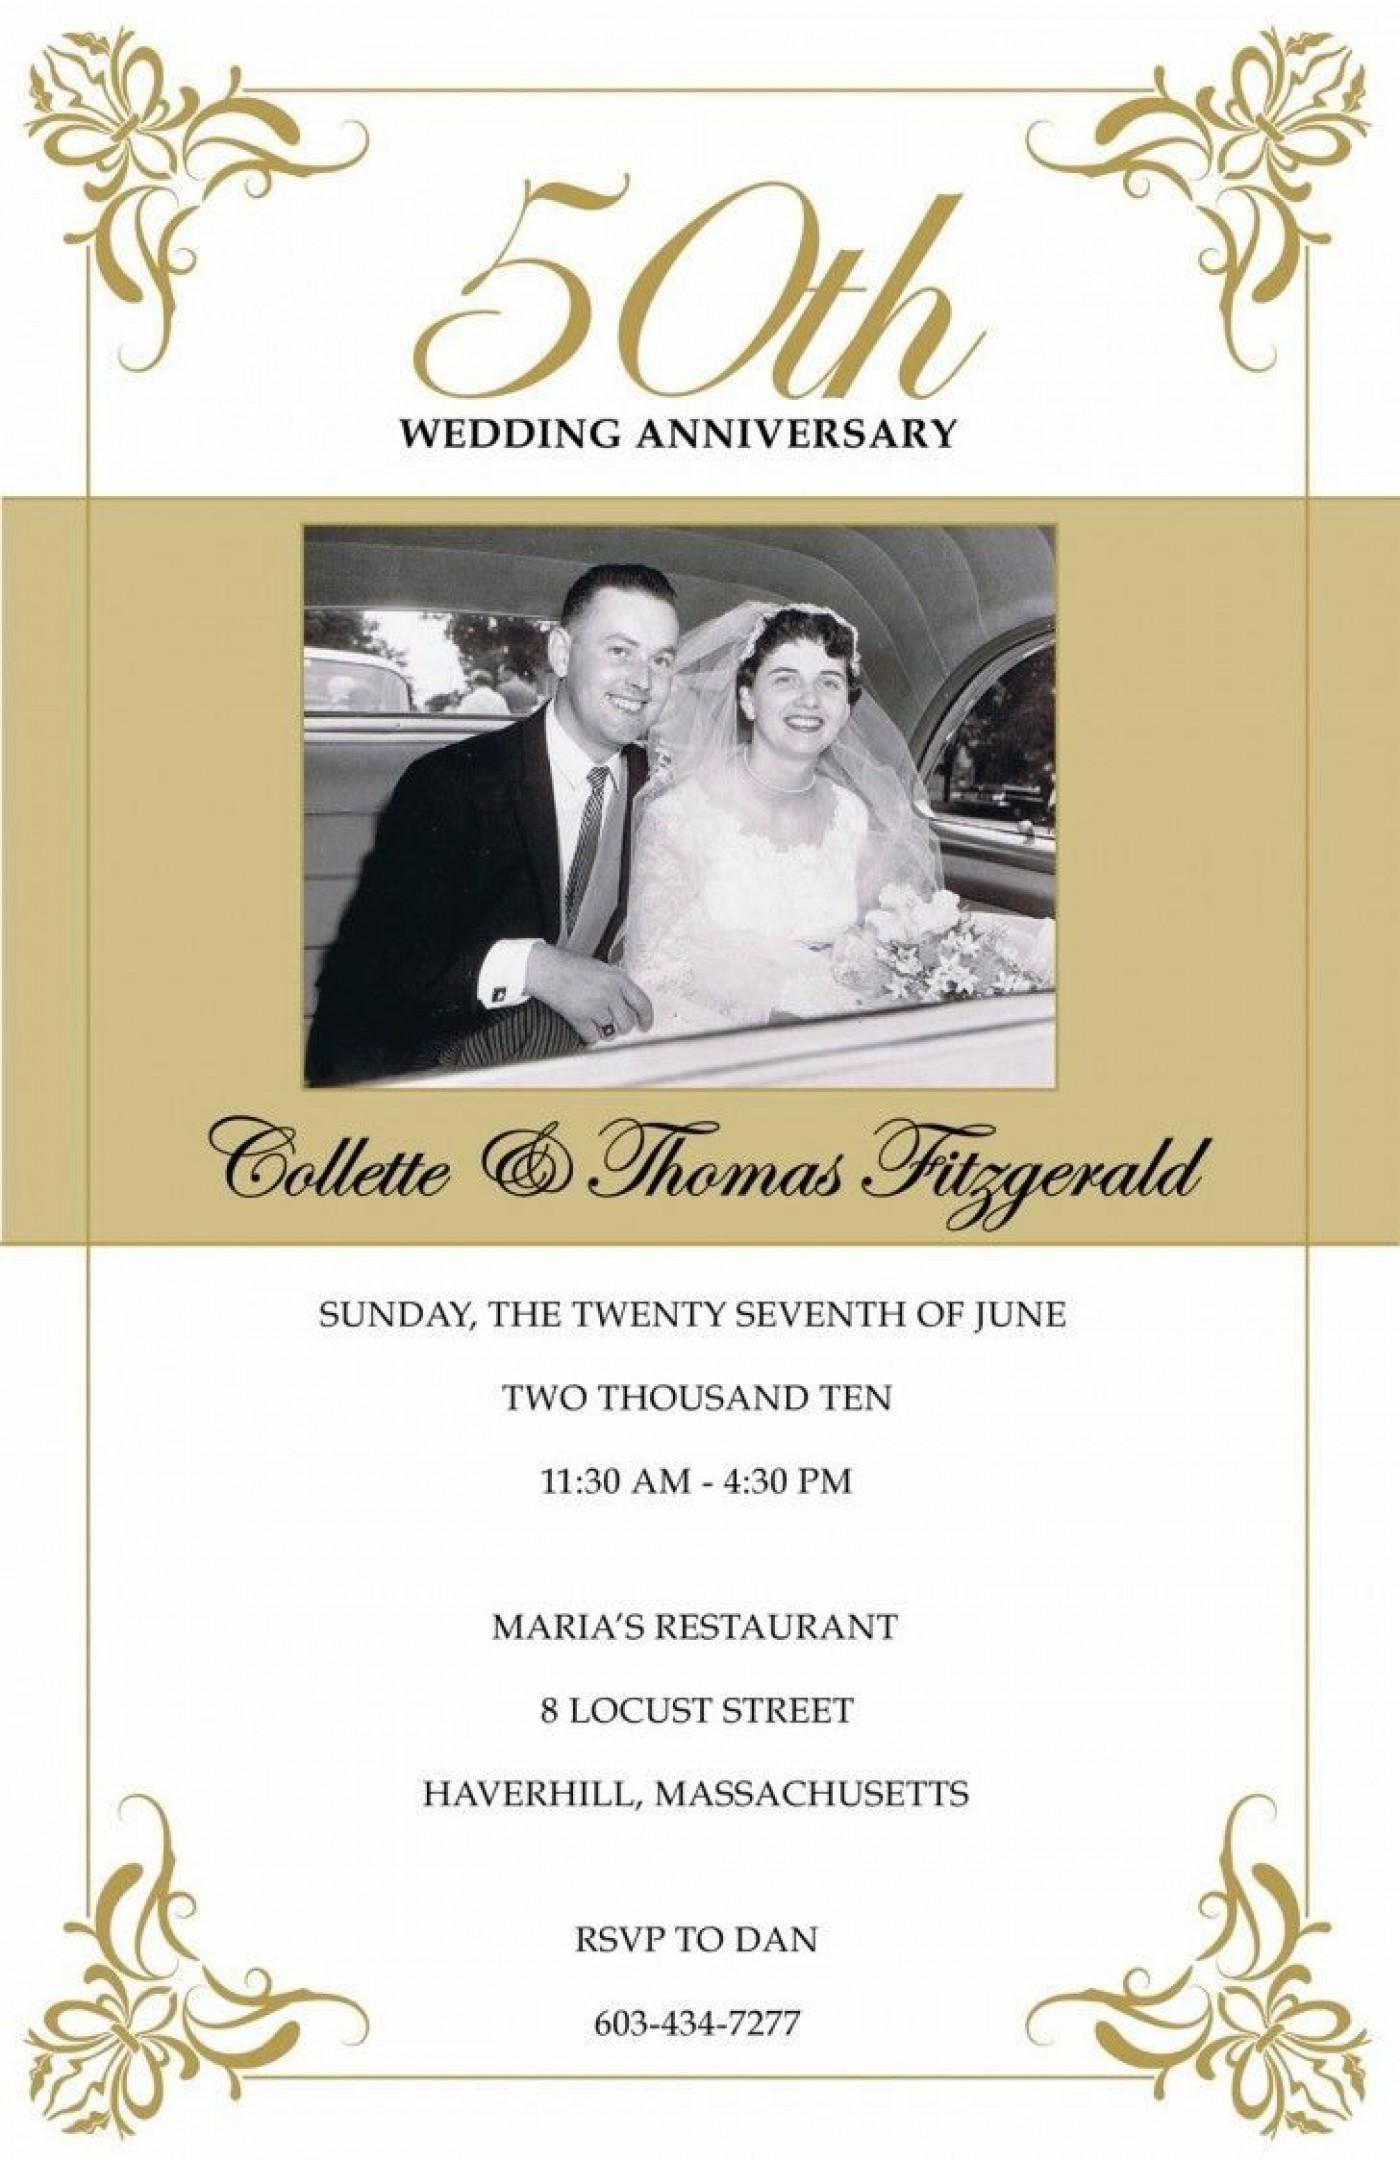 009 Breathtaking 50th Anniversary Invitation Template High Resolution  Wedding Microsoft Word Free Download1400